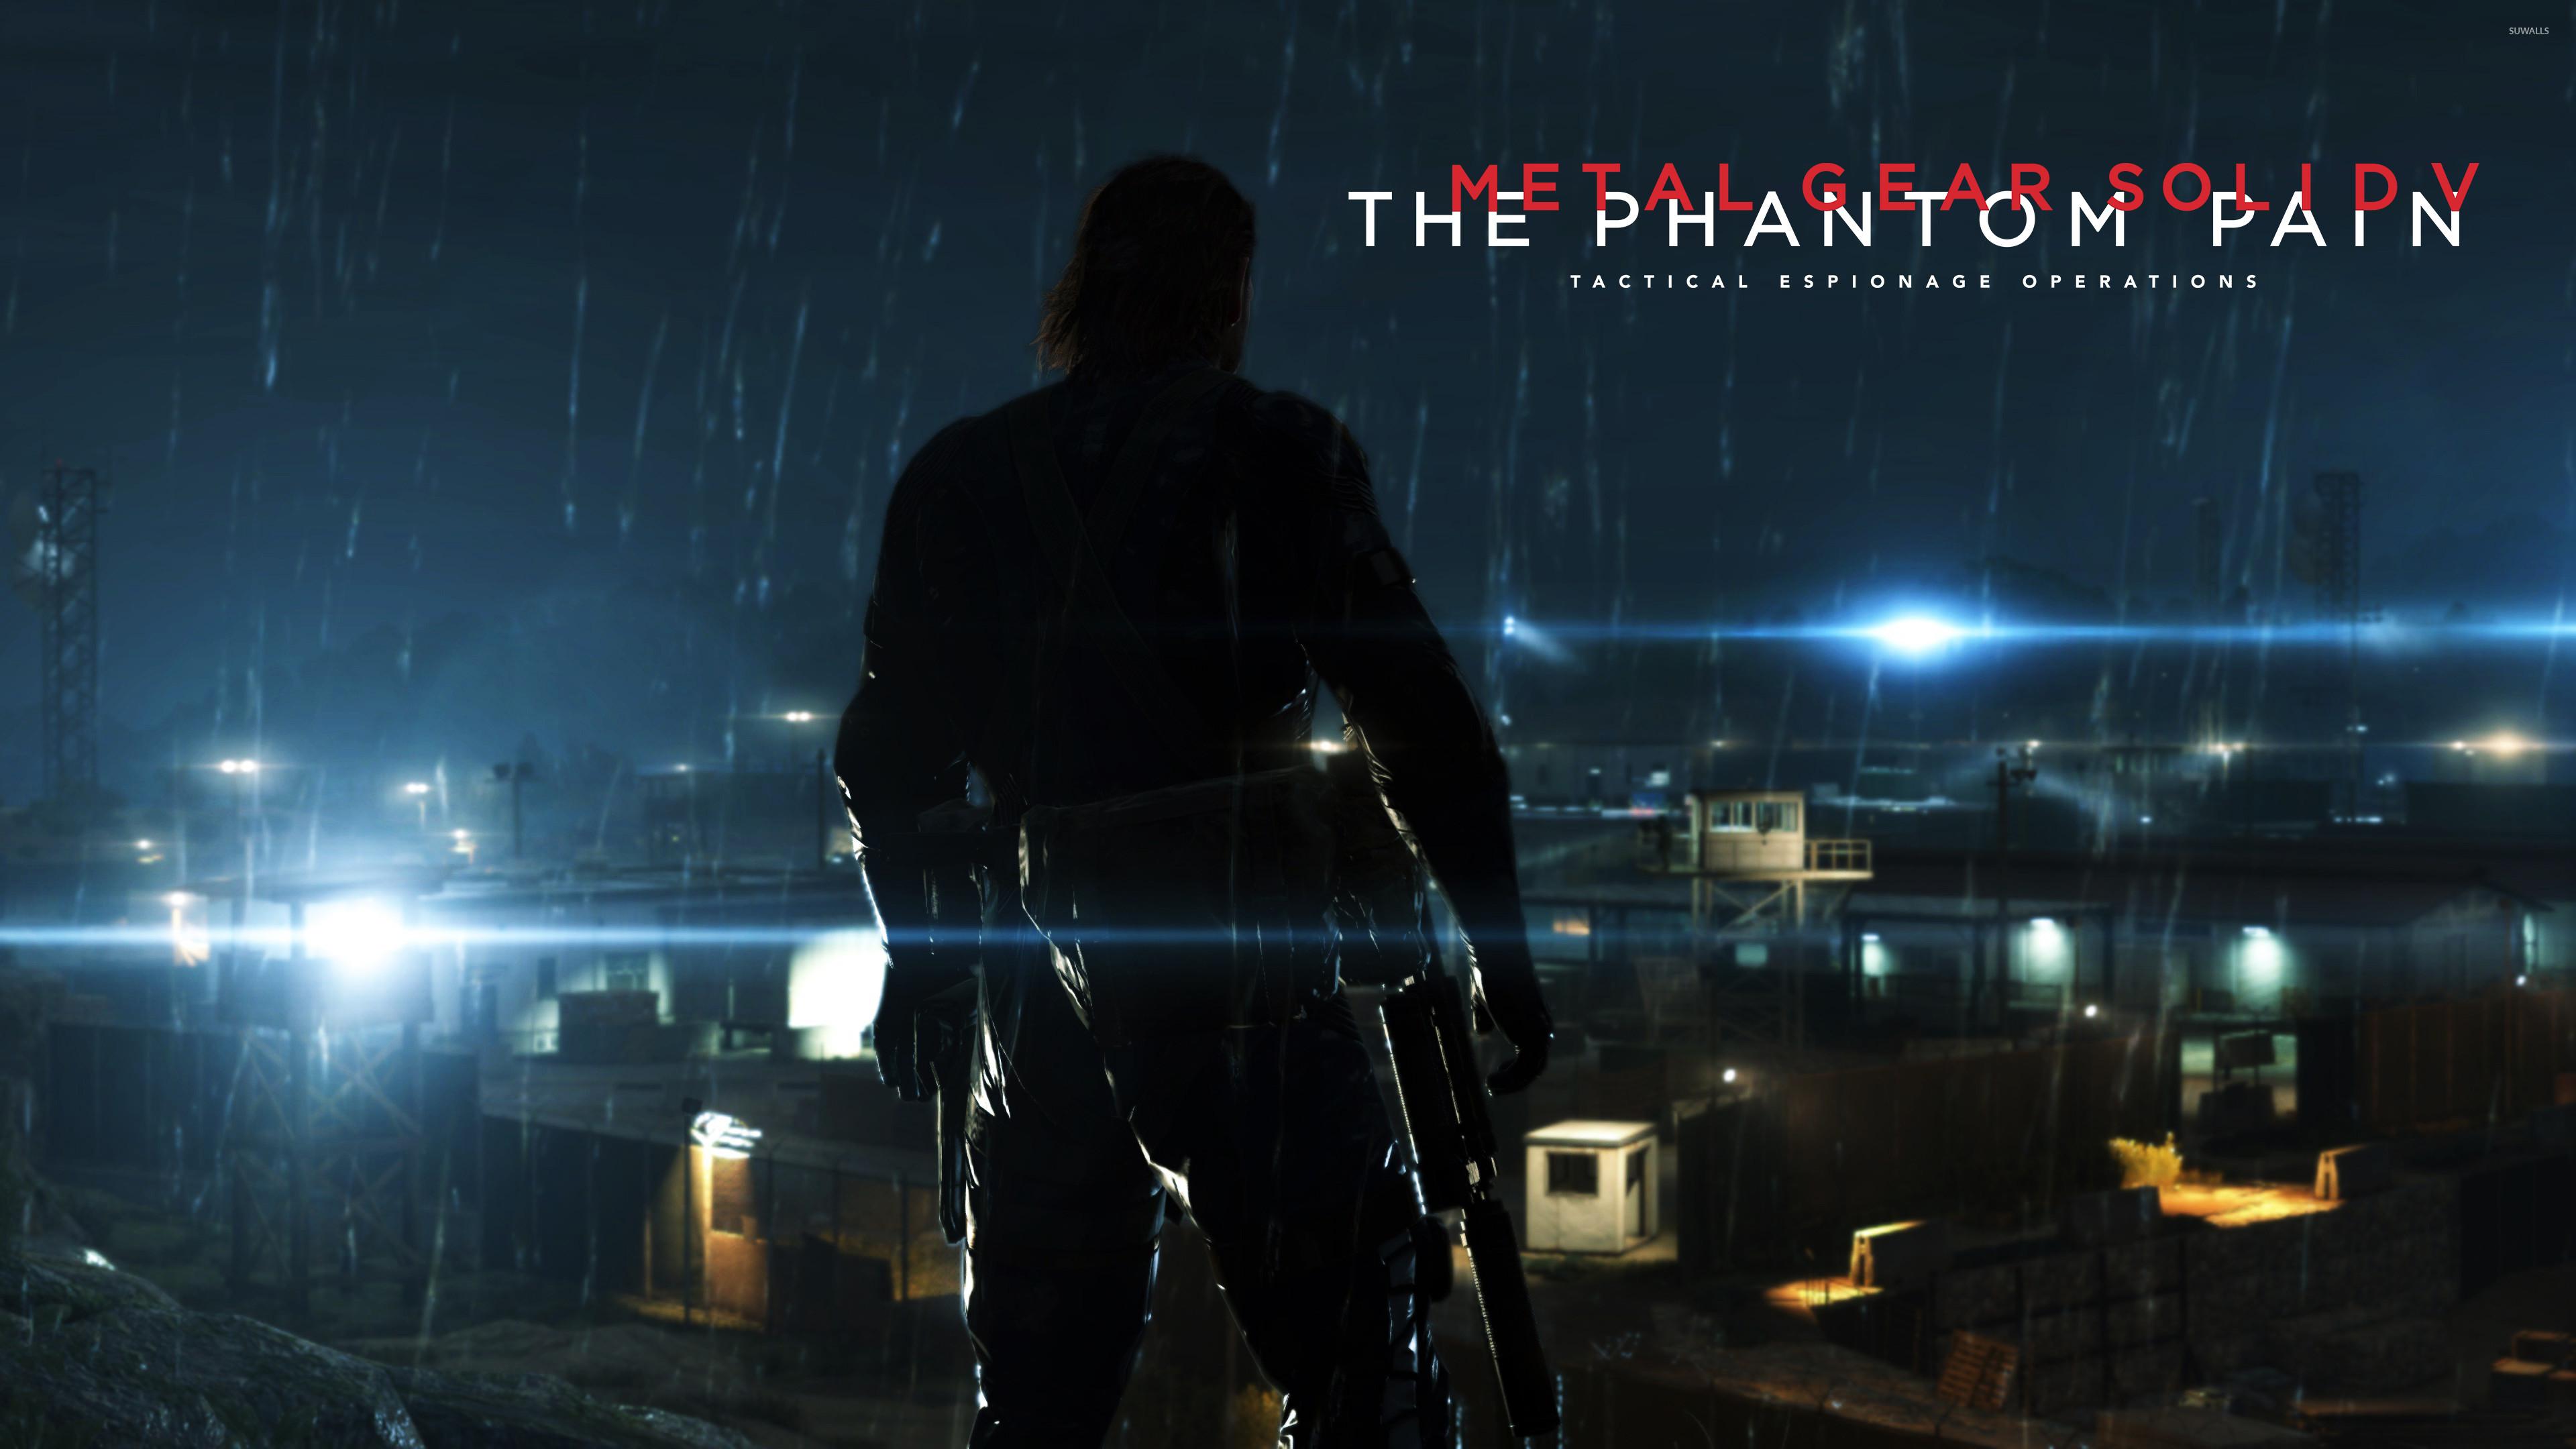 Big Boss in Metal Gear Solid V: The Phantom Pain wallpaper